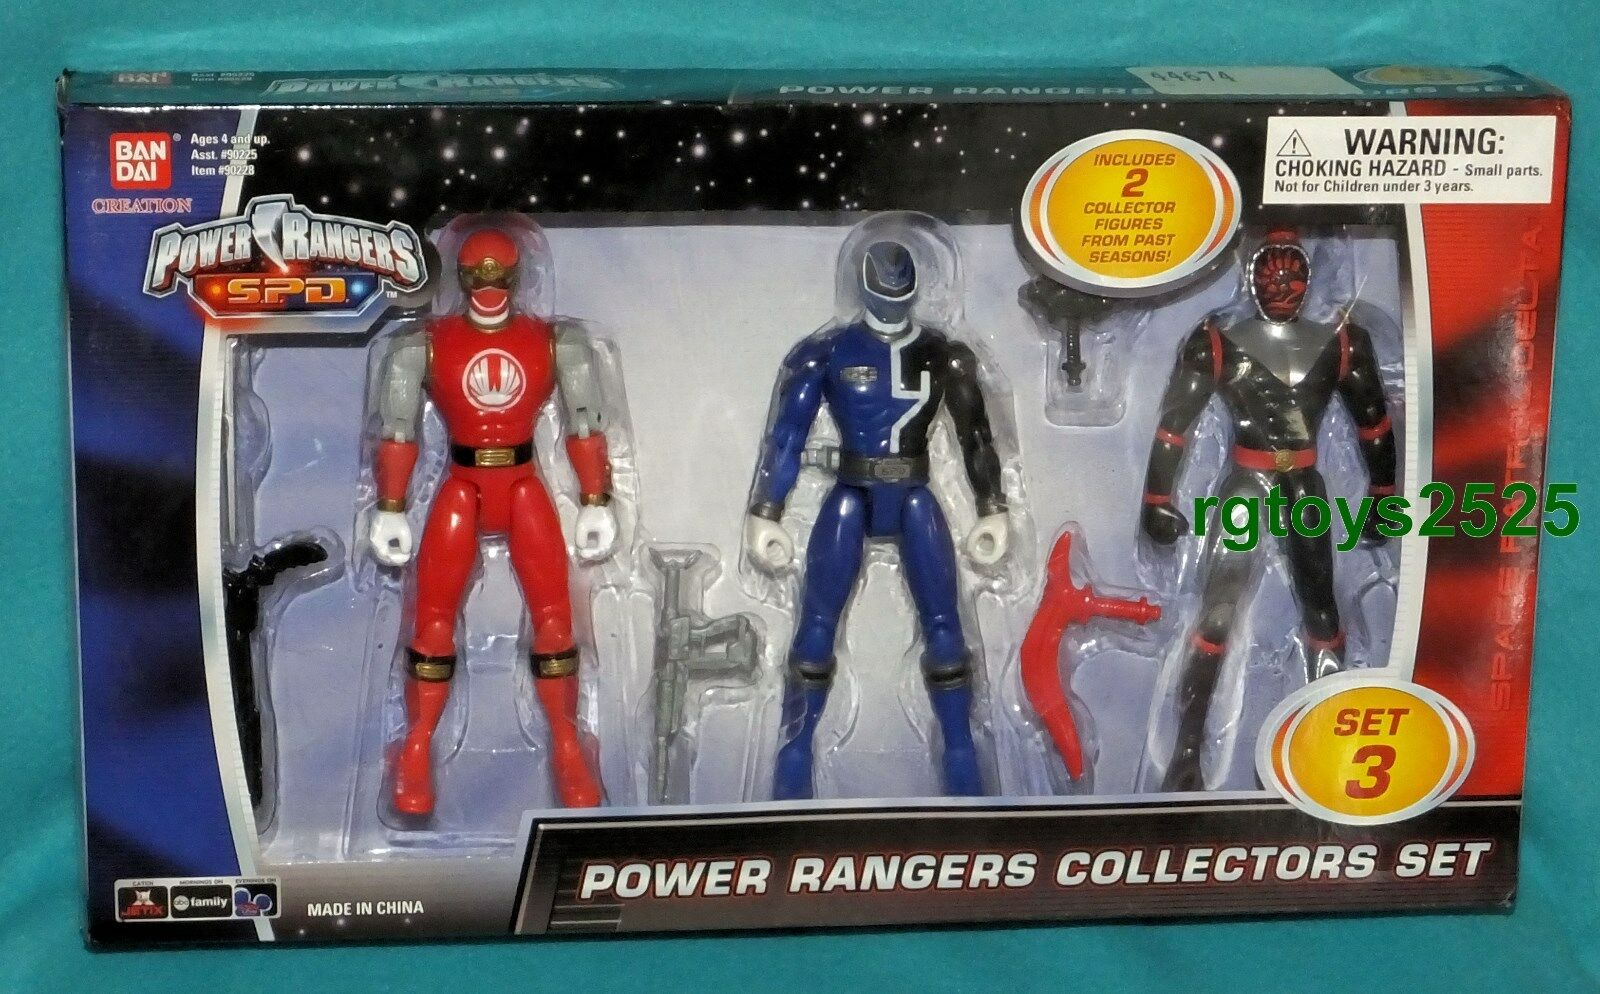 Energia Rangers SPD 5  blu Ranger  Ninja Storm rosso Ranger & Kelzak nuovo 2004  ordina ora i prezzi più bassi